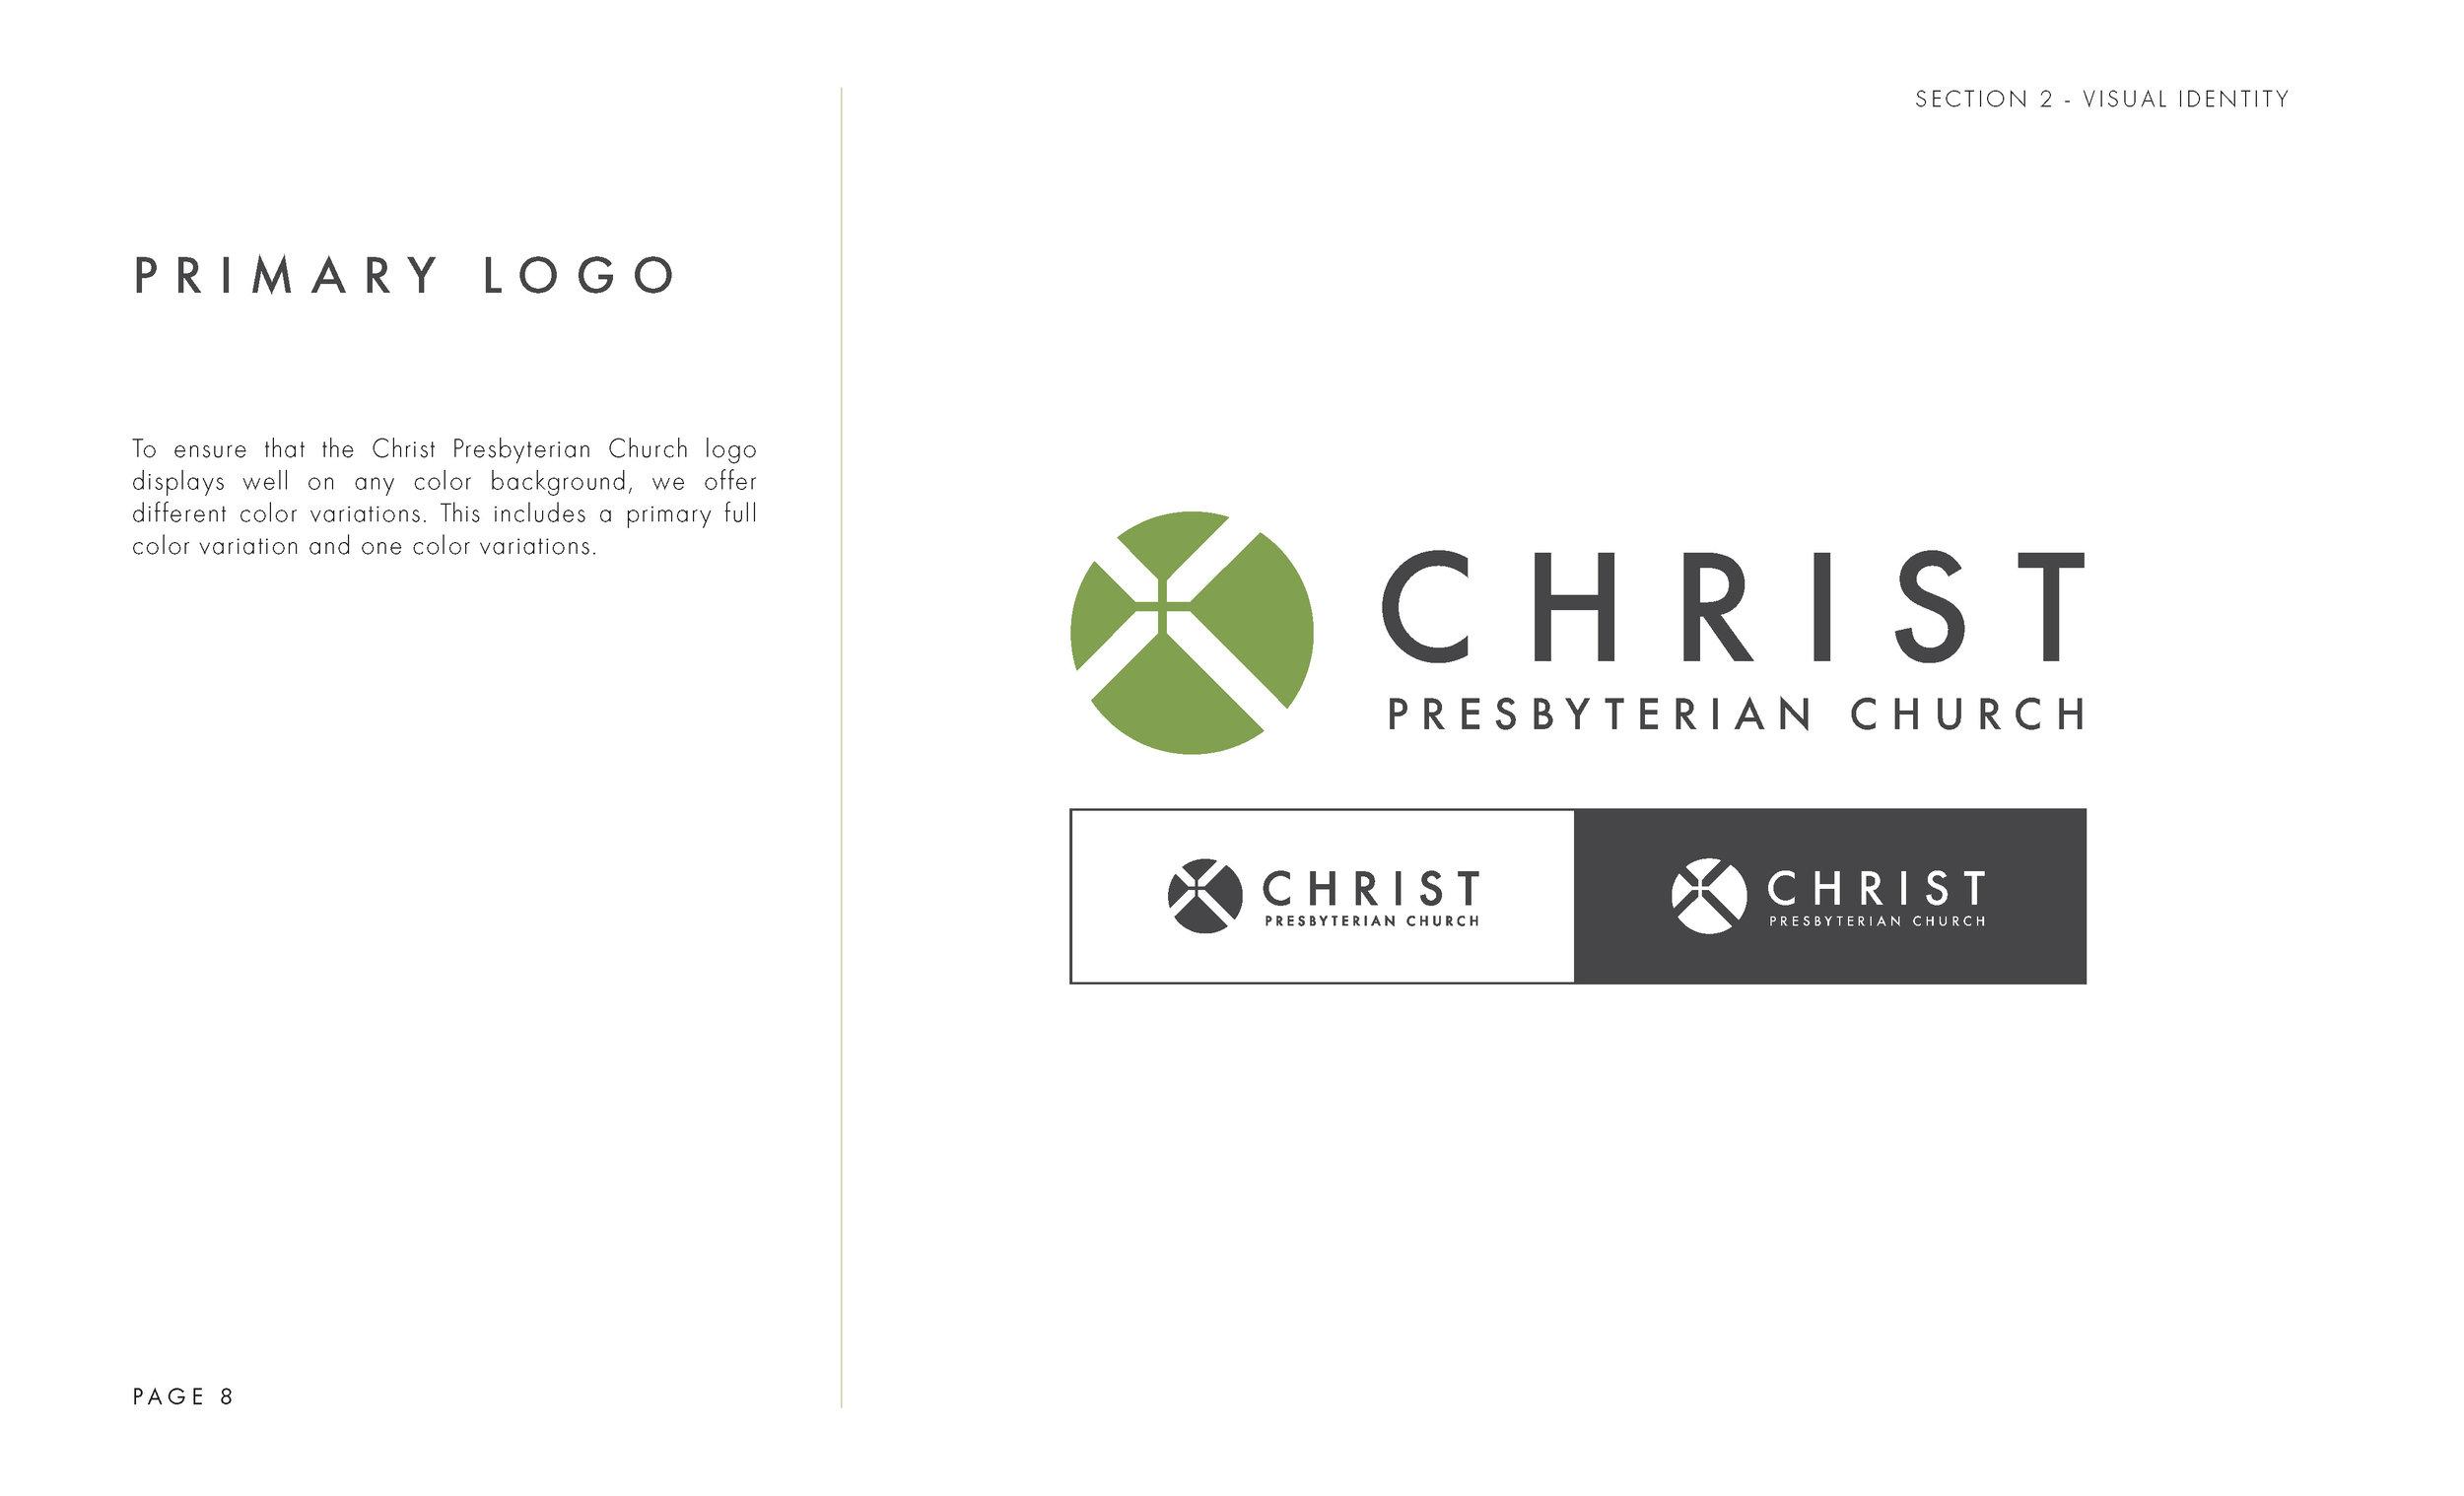 StyleGuide_ChristPres_18_Page_08.jpg